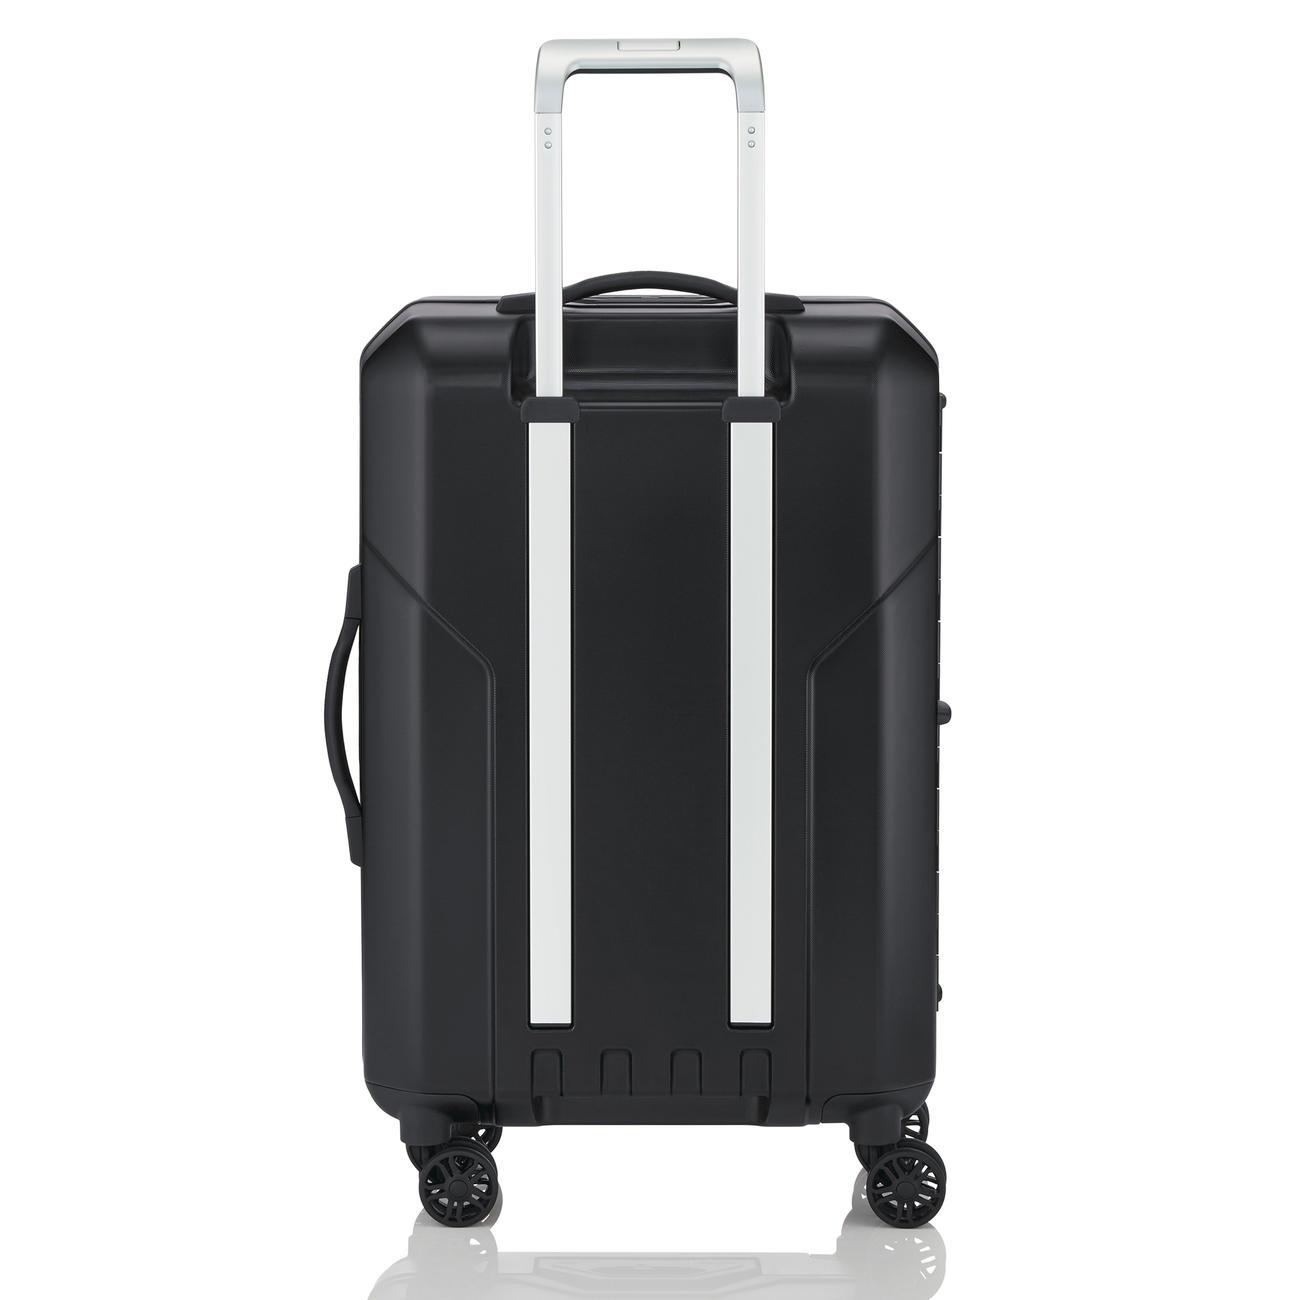 acheter valise rigide titan senolite en ligne pas cher. Black Bedroom Furniture Sets. Home Design Ideas